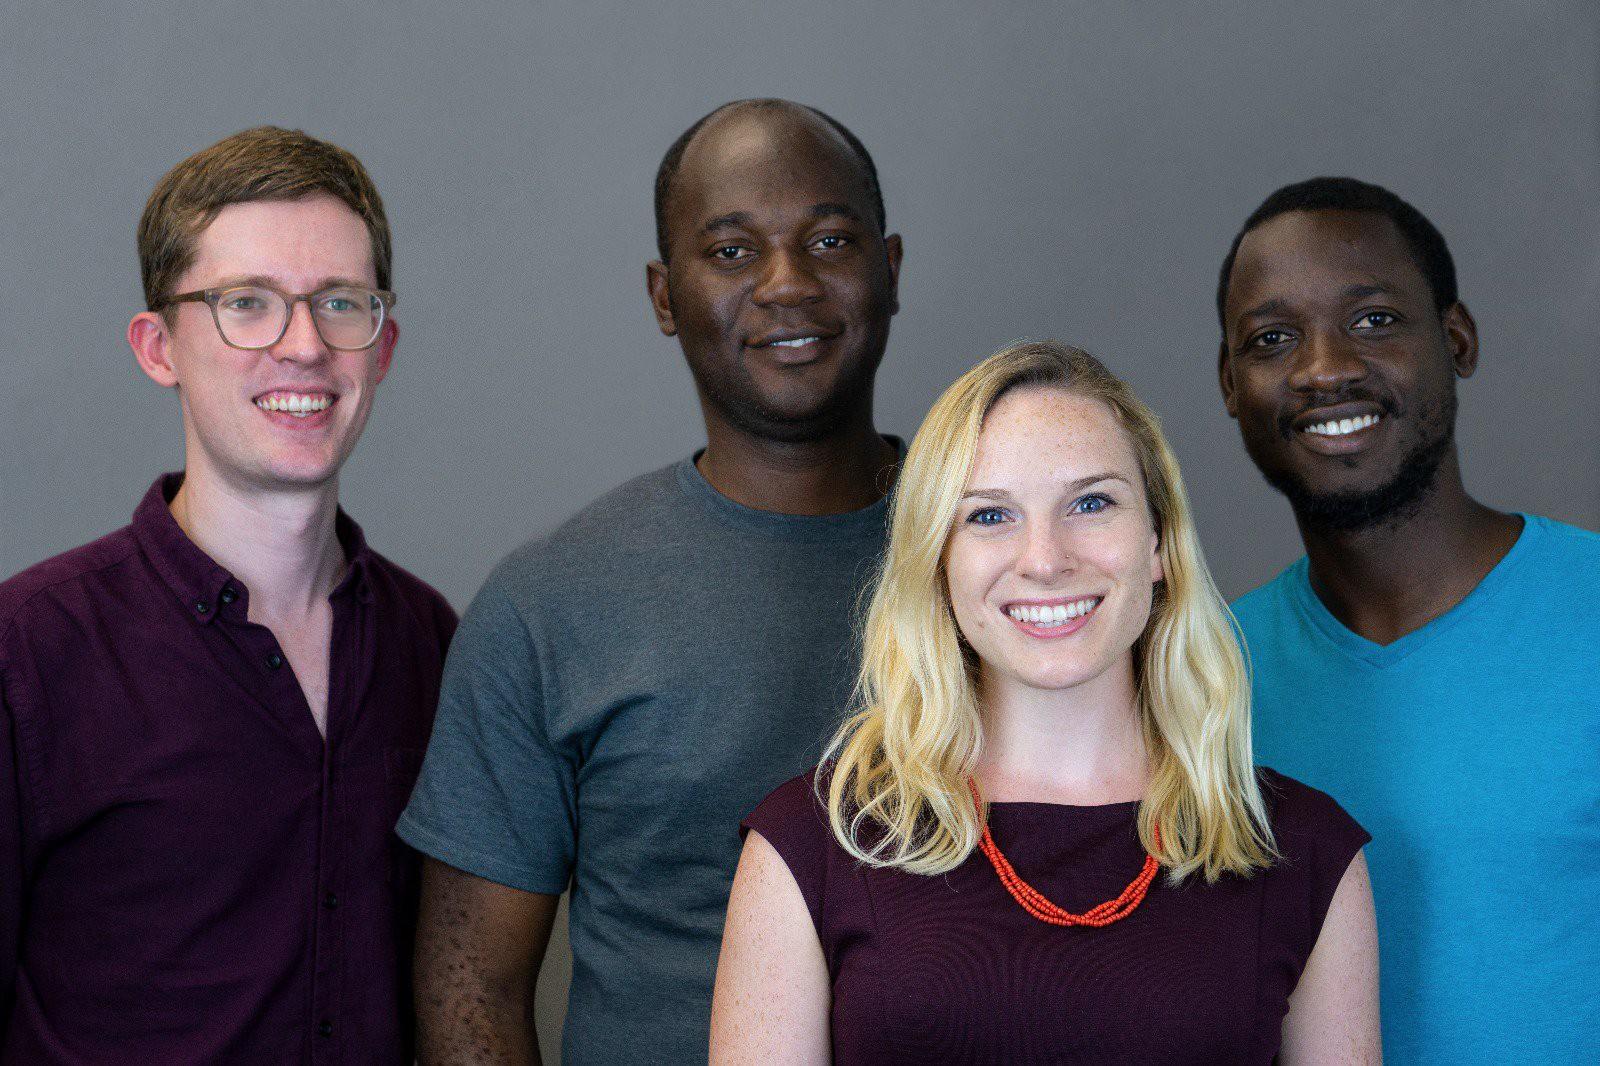 Nigerian medtech startup MDaaS Global raises over $1m in equity funding